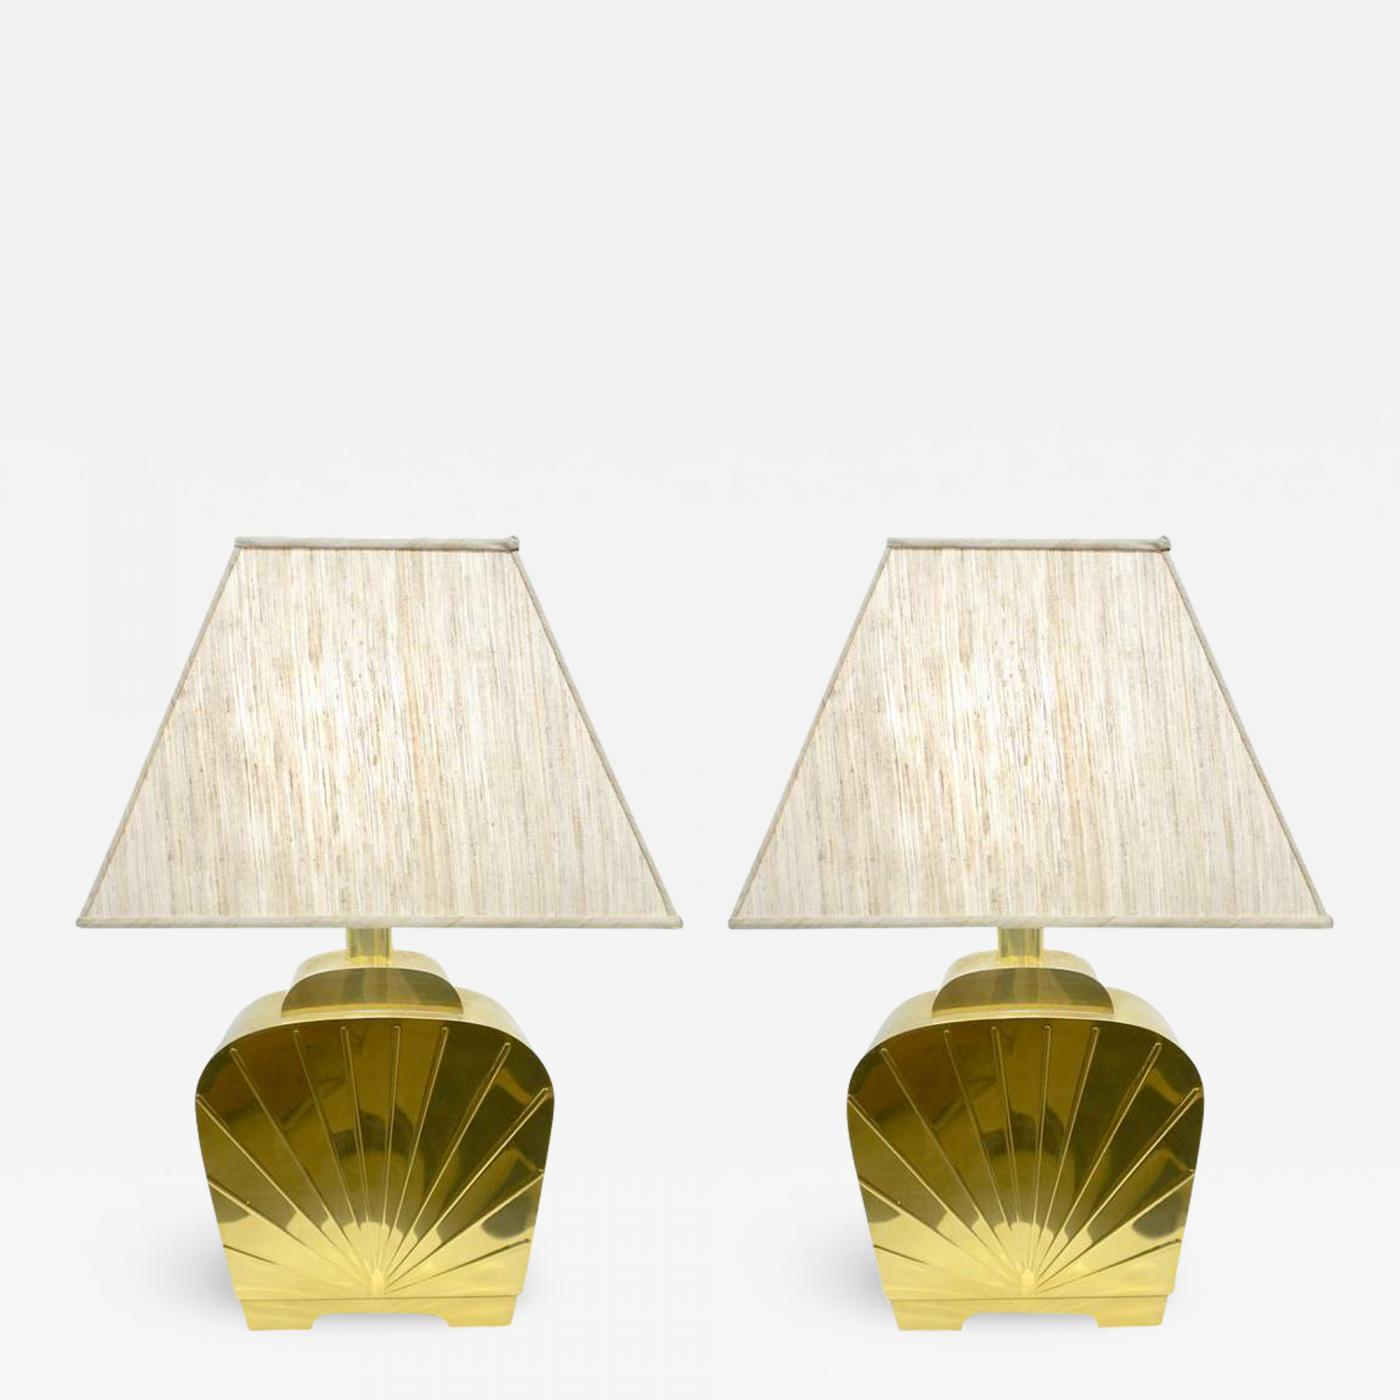 Hollywood Regency Sculptural Brass Lamp